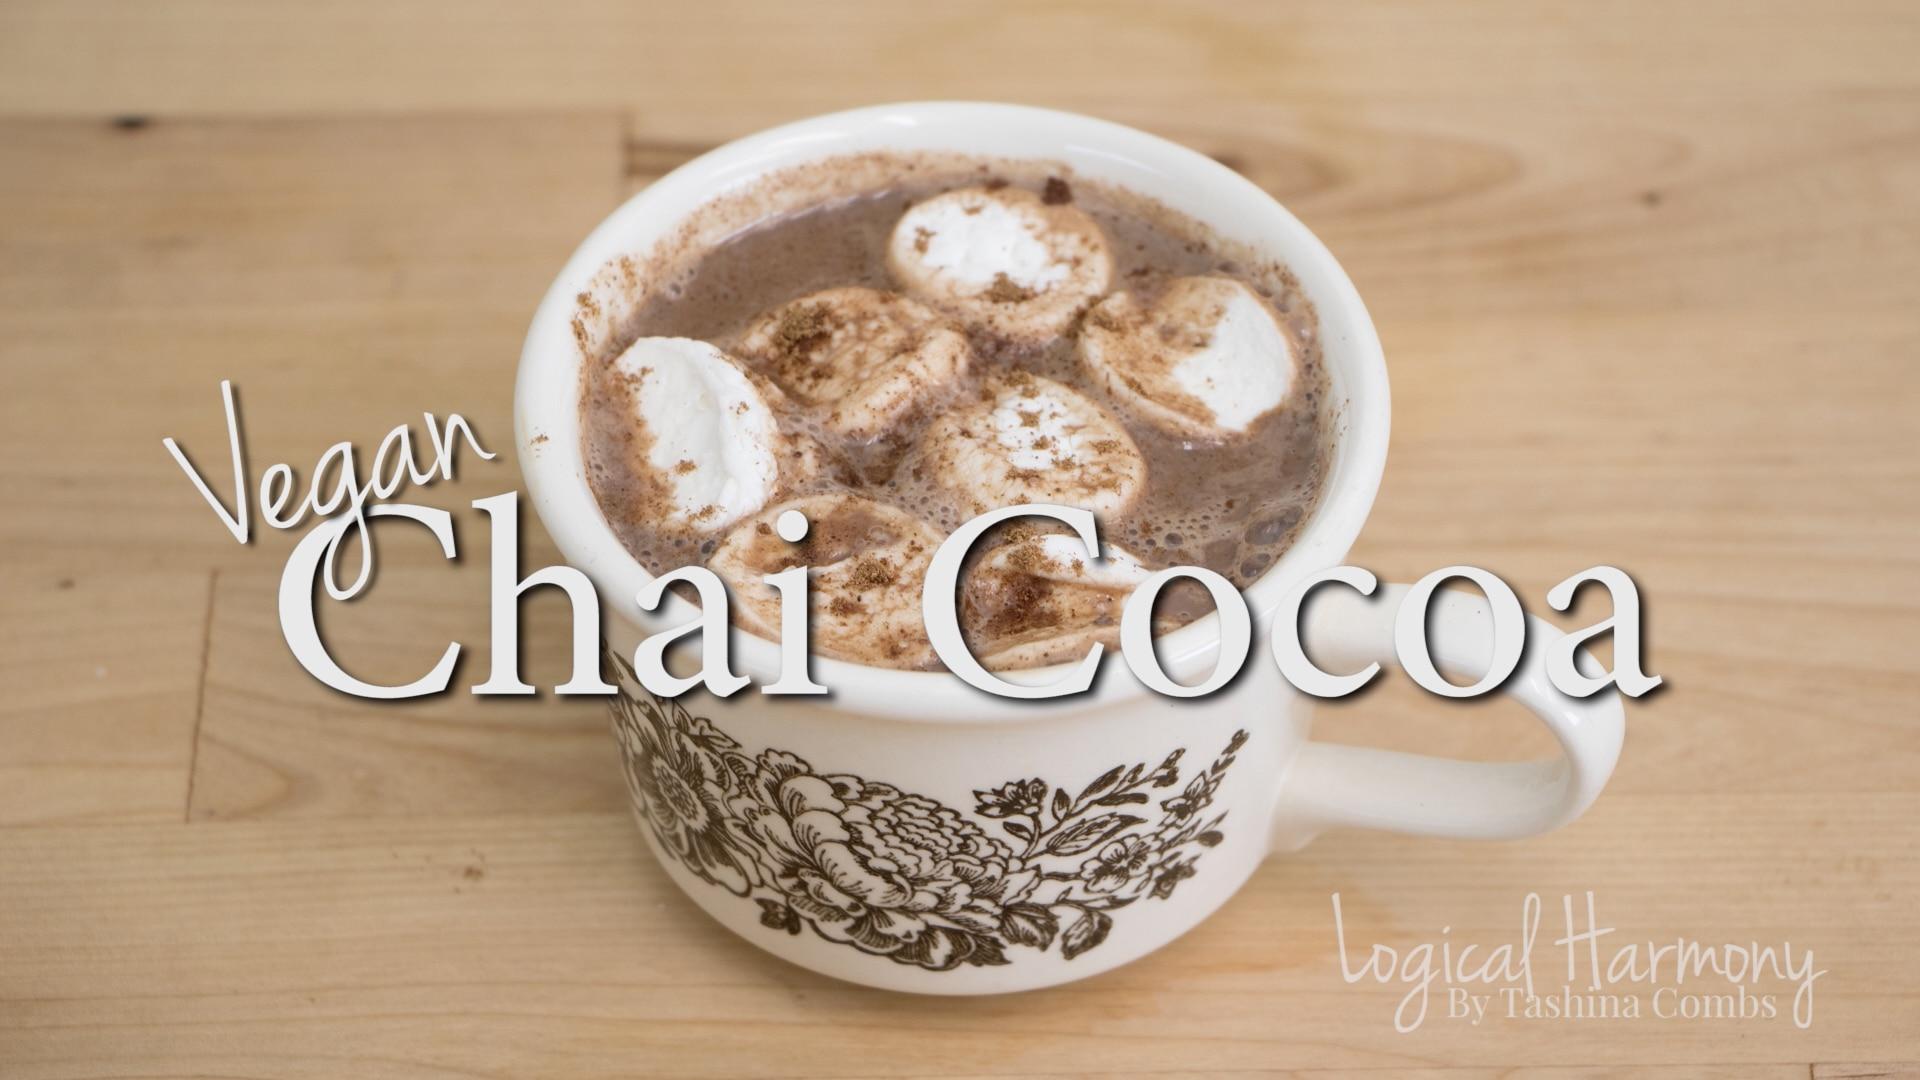 How to Make Chai Cocoa